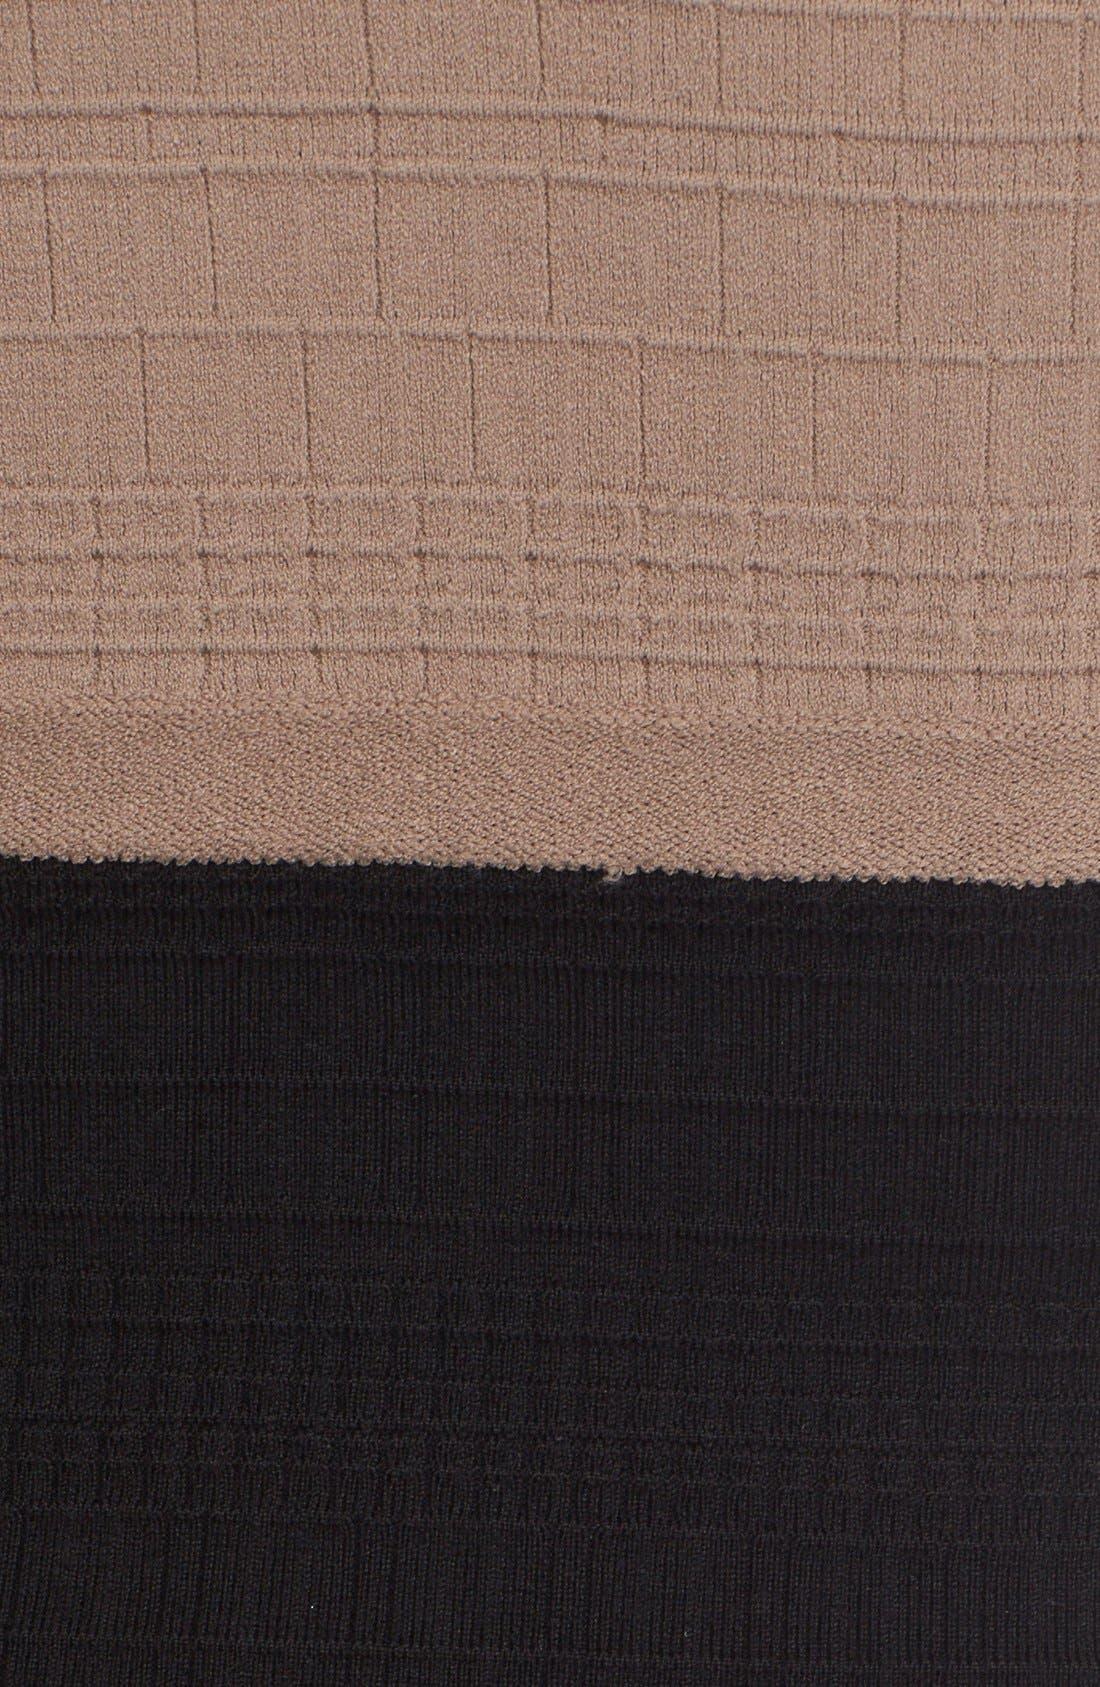 Alternate Image 3  - Narciso Rodriguez Colorblock Wool & Silk Knit Dress